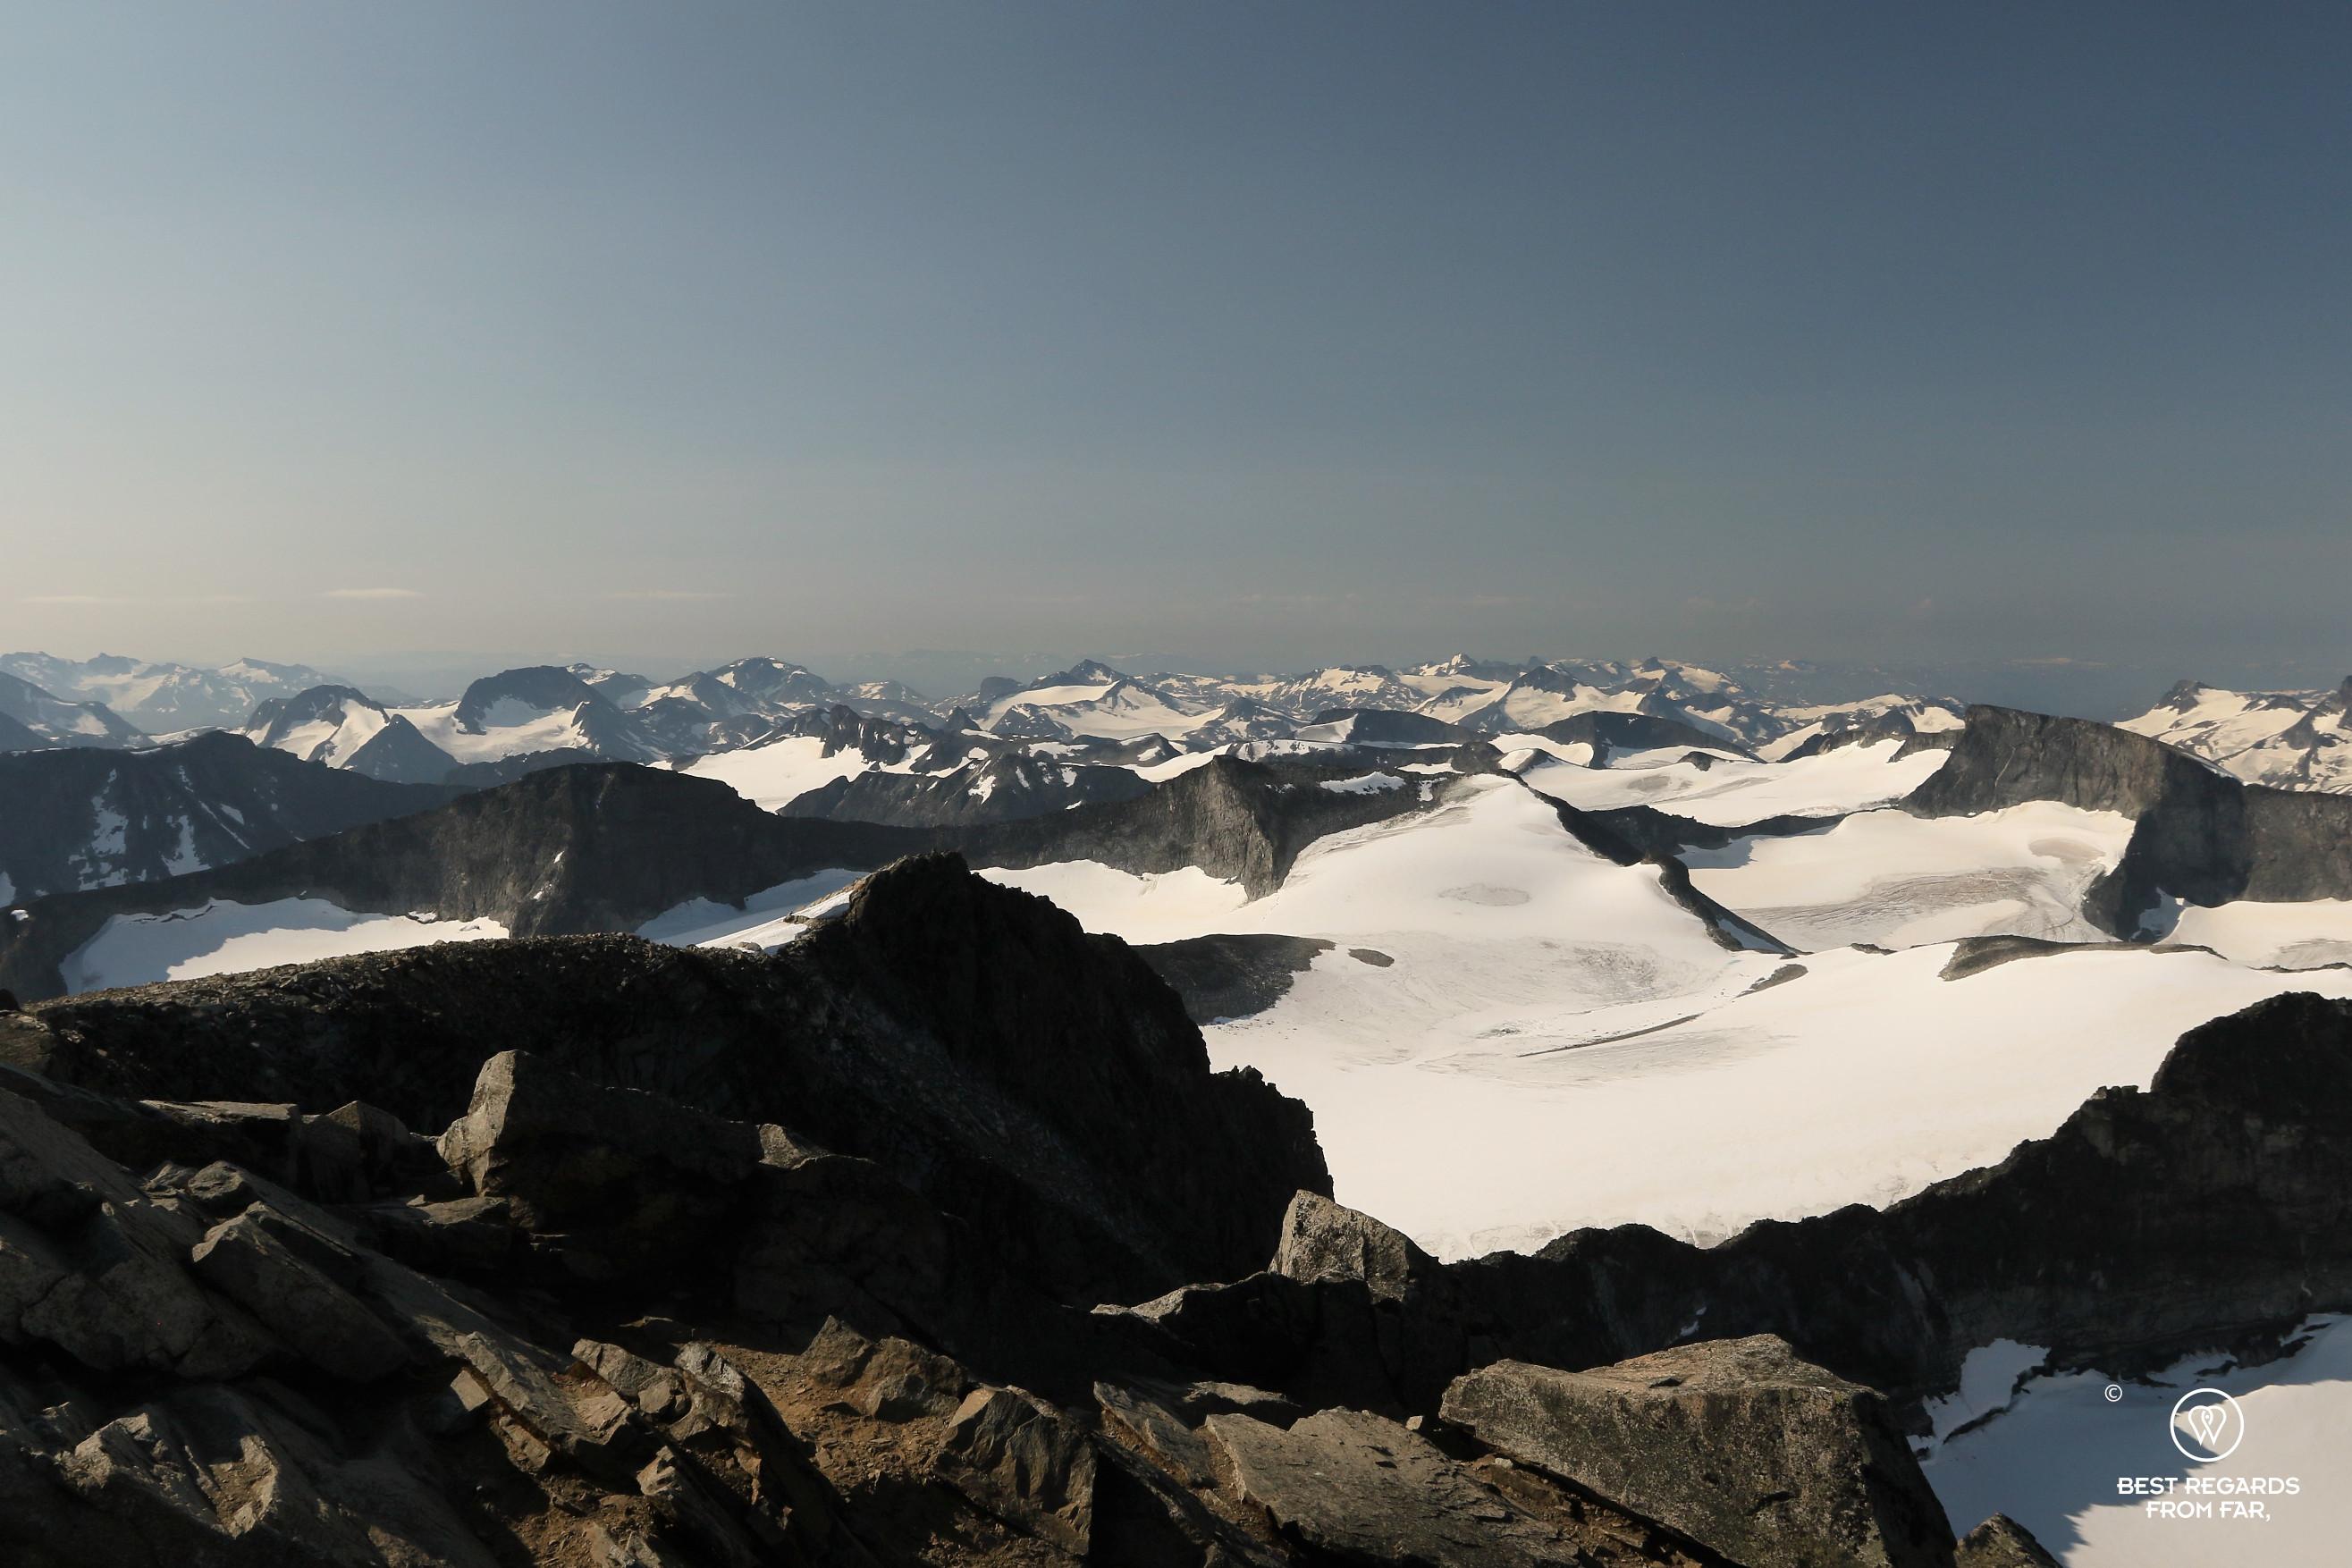 Landscape of snowy peaks seen from Galdhøpiggen, Norway's highest